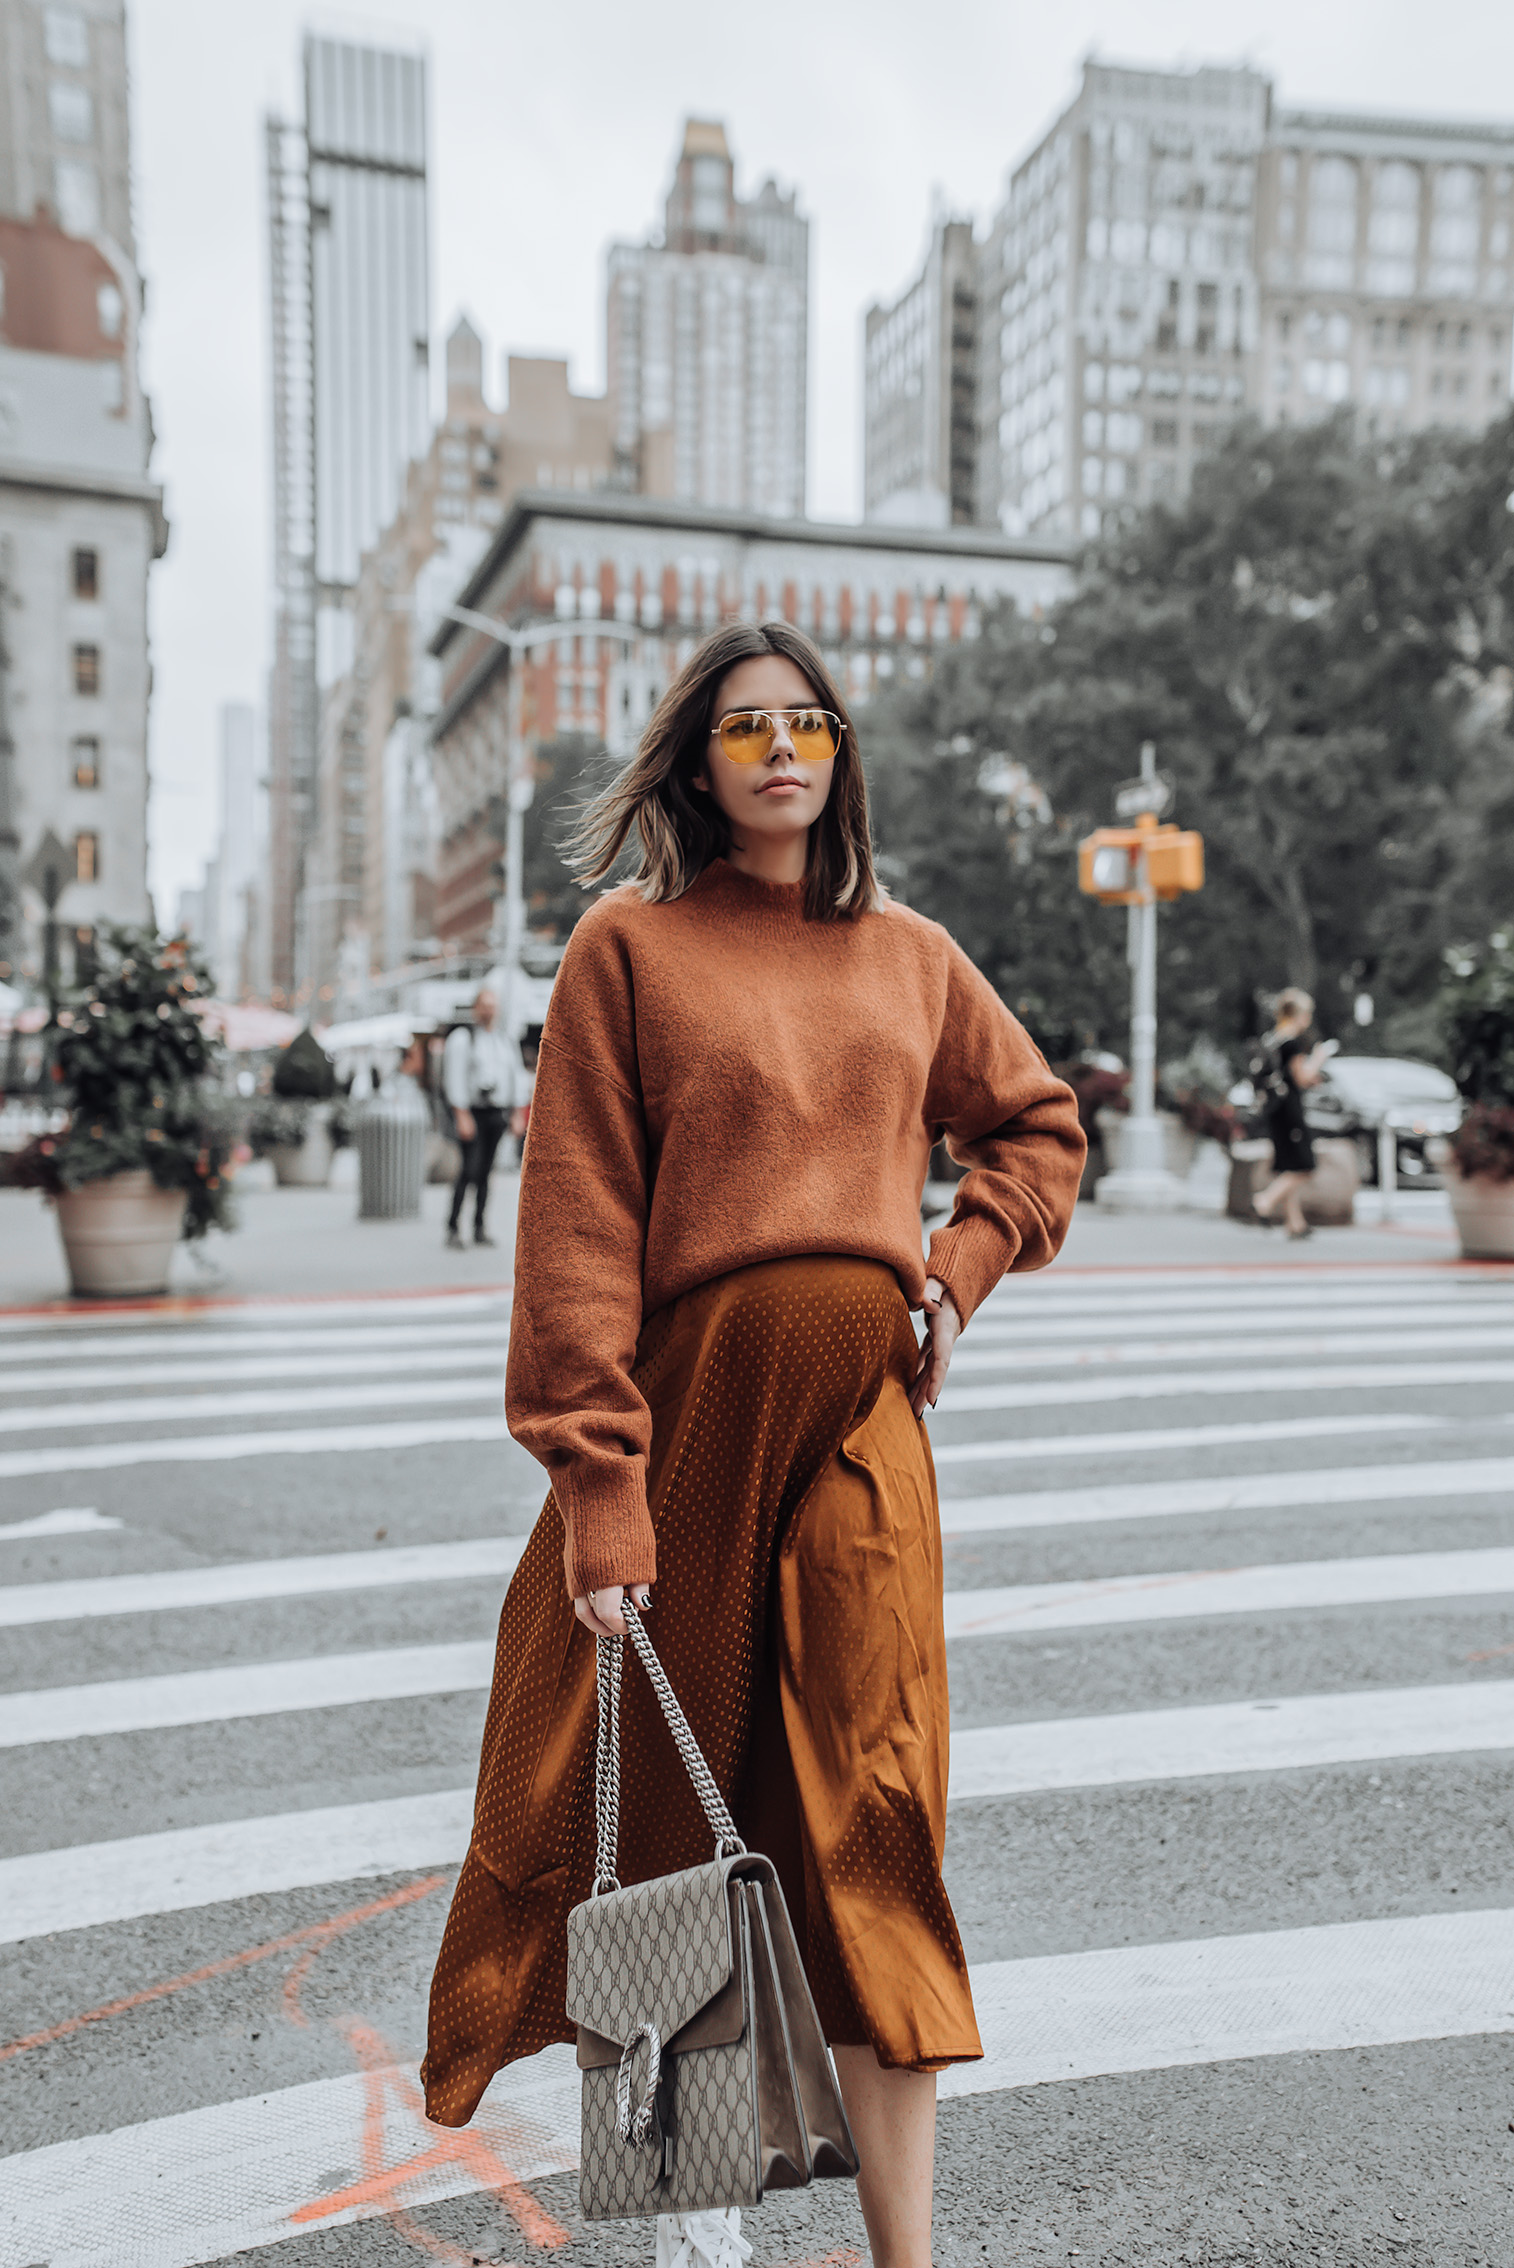 Fall tones | Midi Dress | Mock Neck Sweater | Gucci Bag | Glasses #streetstyle #ootd #liketkit #gucci